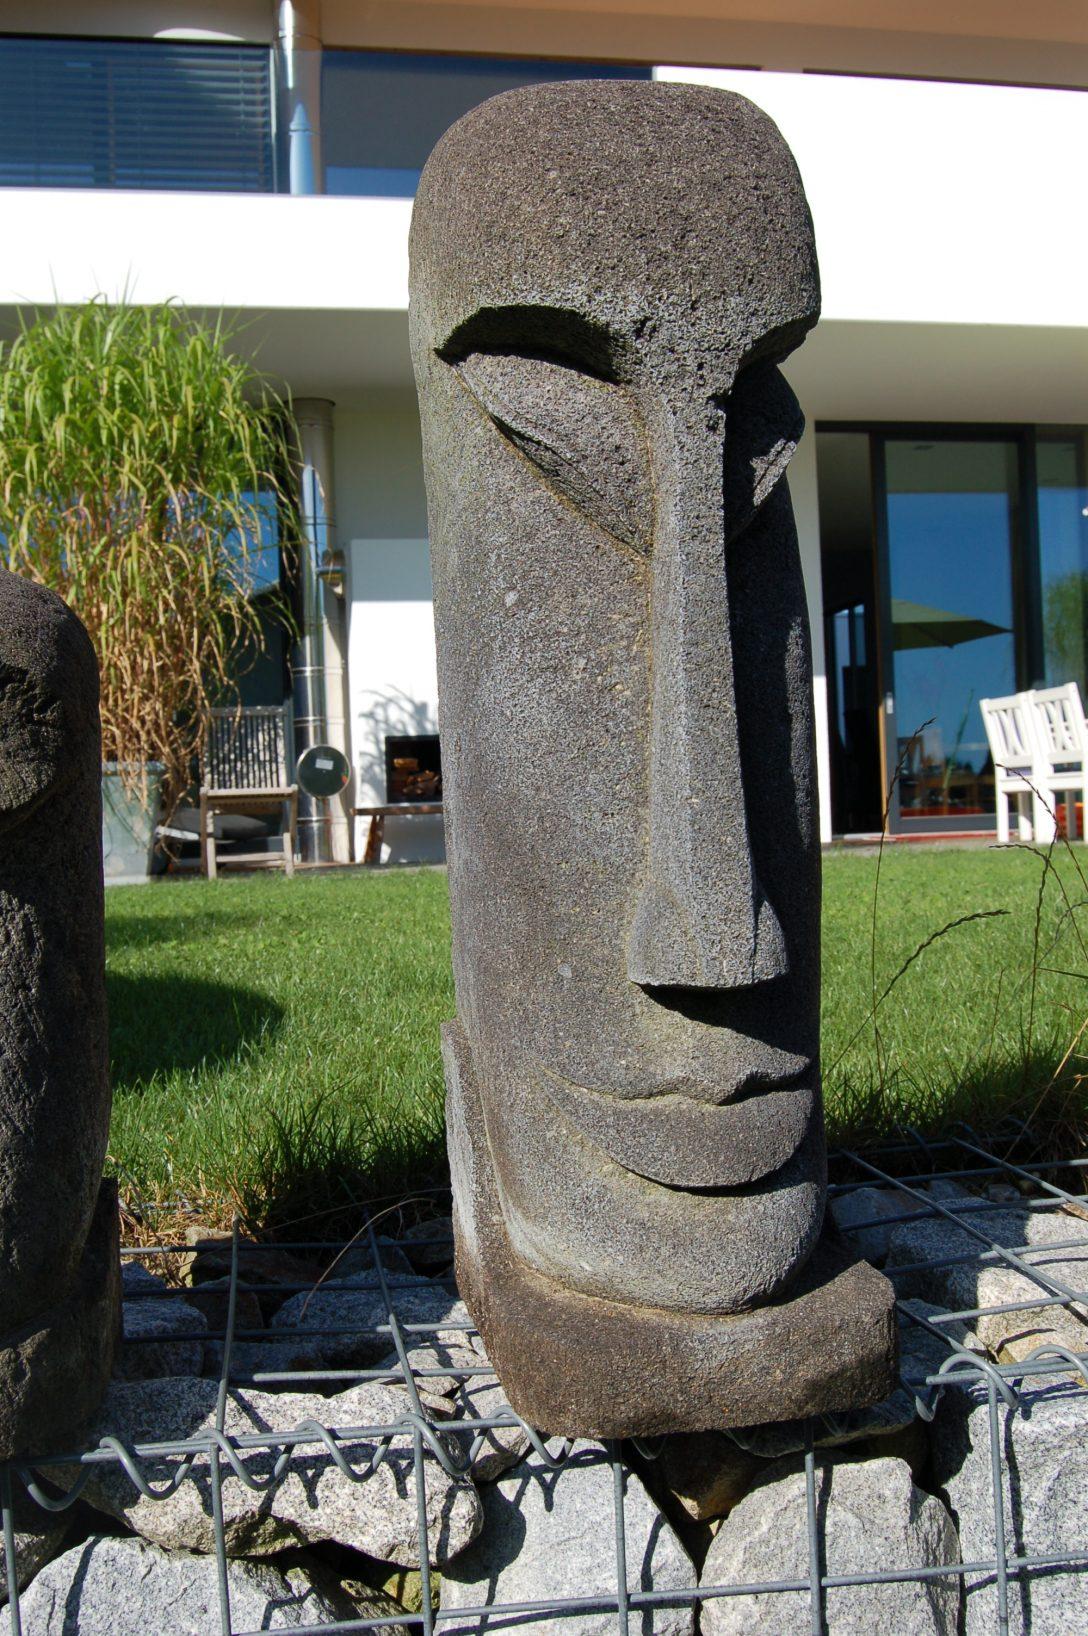 Large Size of Garten Skulpturen Moai Und Osterinsel Steinfiguren Als Moderne Gartenskulpturen Truhenbank Feuerstelle Sichtschutz Im Pergola Heizstrahler Relaxliege Garten Garten Skulpturen